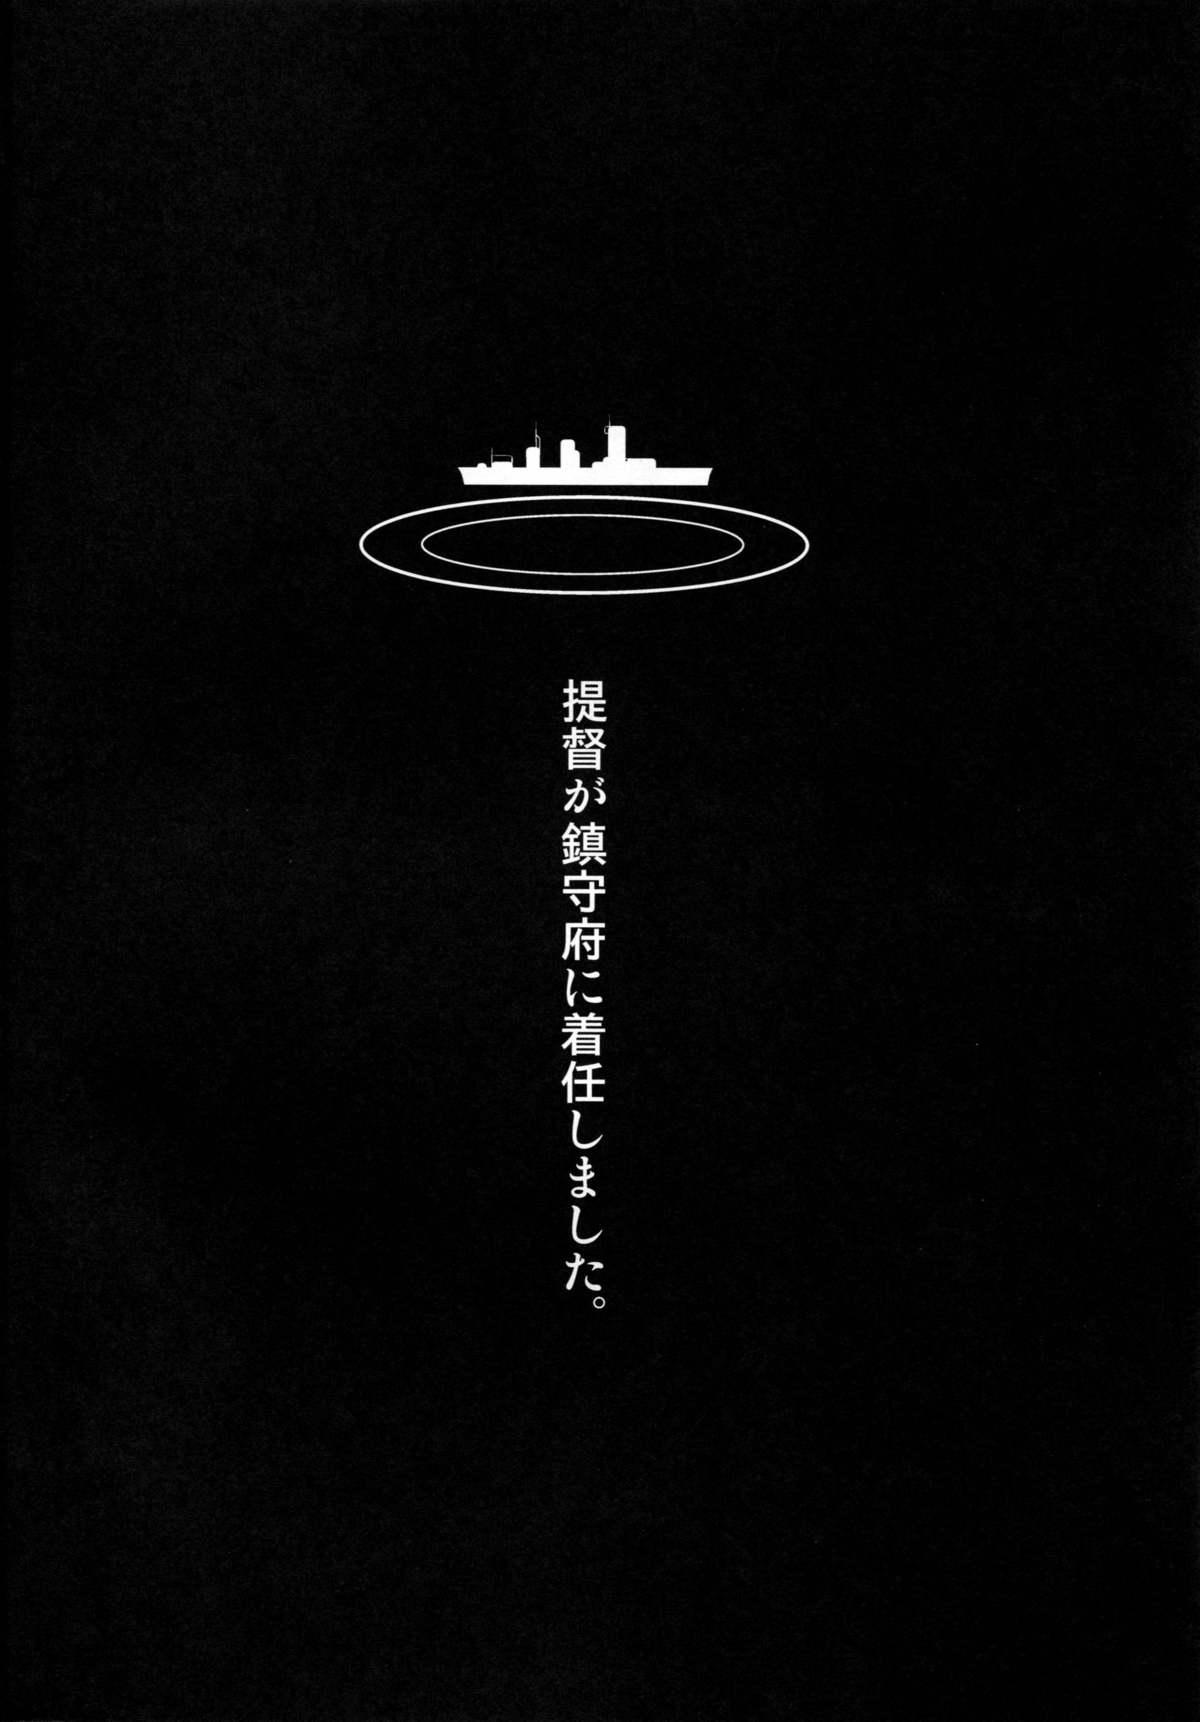 Kantai Collection Takao Hen Kai 2